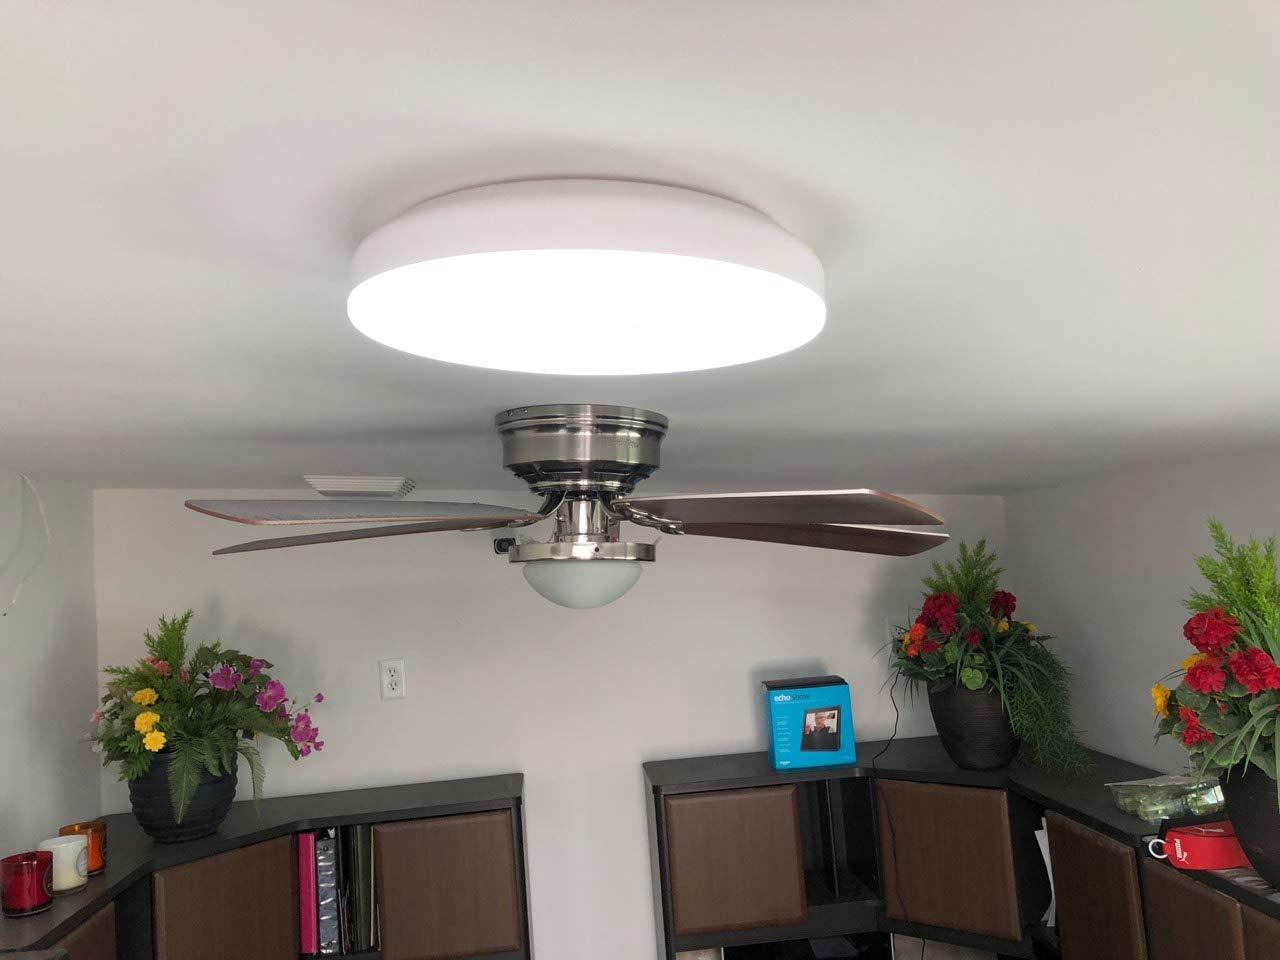 Premium 14'' Flush Mount LED Ceiling Light Fixture with Motion Sensor, Remote Control & Timer - Dimmable & Adjustable Light Color (Warm 2700K-5000K Cool) - Bedroom, Dining Room, Bathroom and Closet